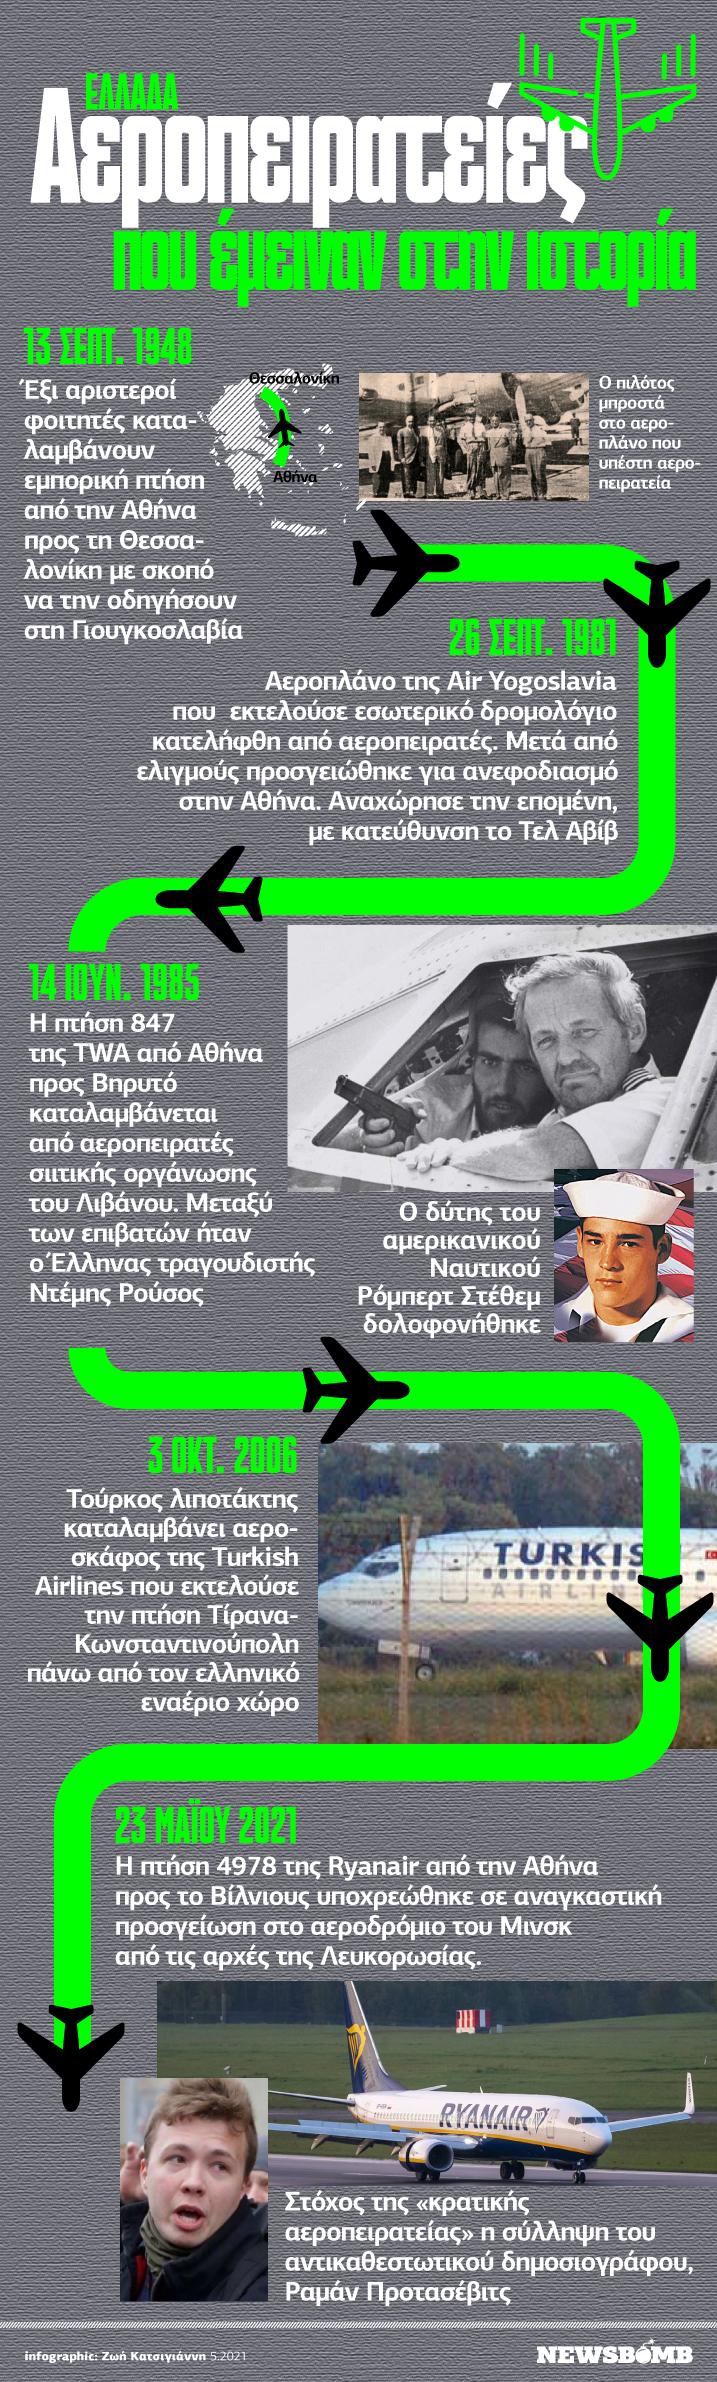 AEROPEIRATIES ELLADA 2